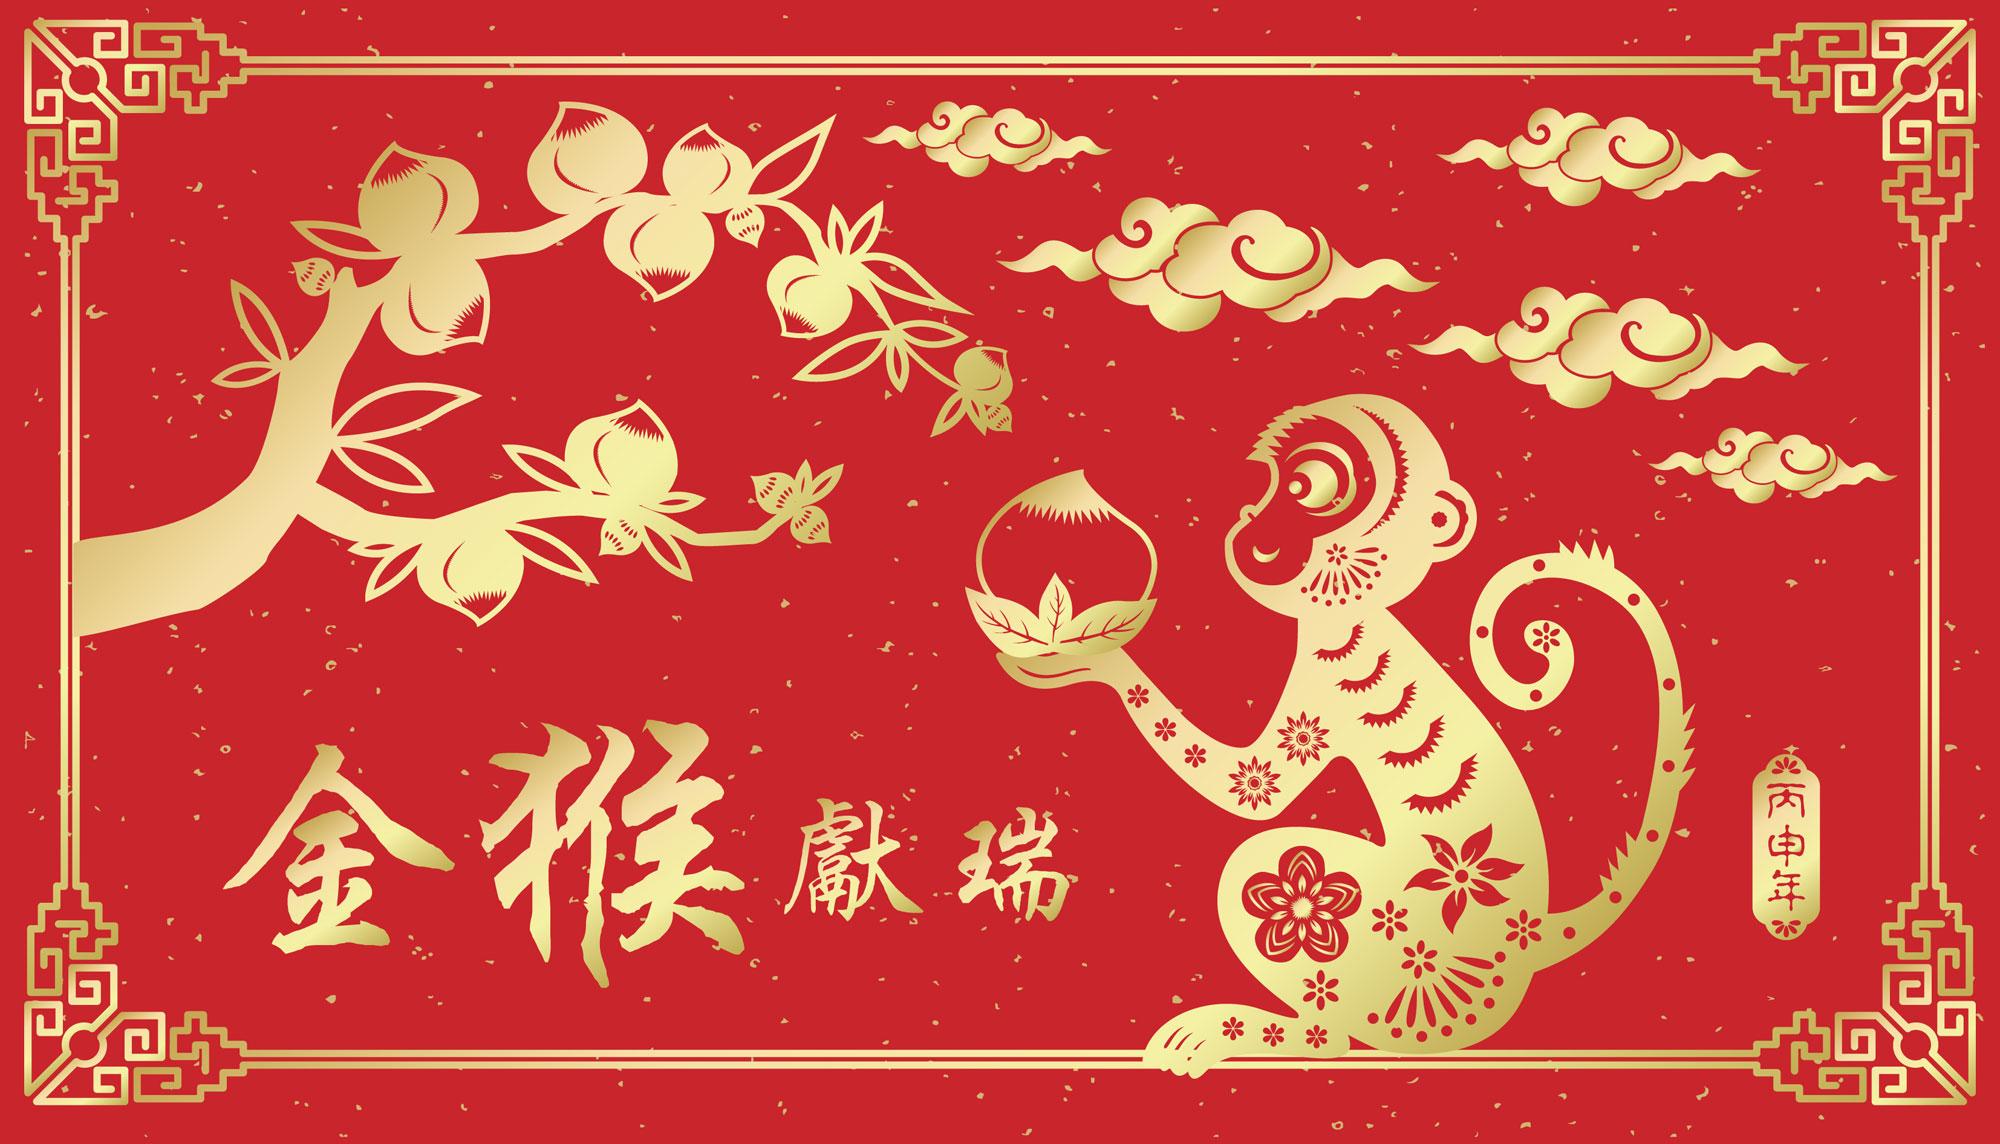 HOROSCOP CHINEZESC - Ce inseamna, de fapt, Anul Maimutei de Foc, inceput pe 8 februarie. Cum te influenteaza?